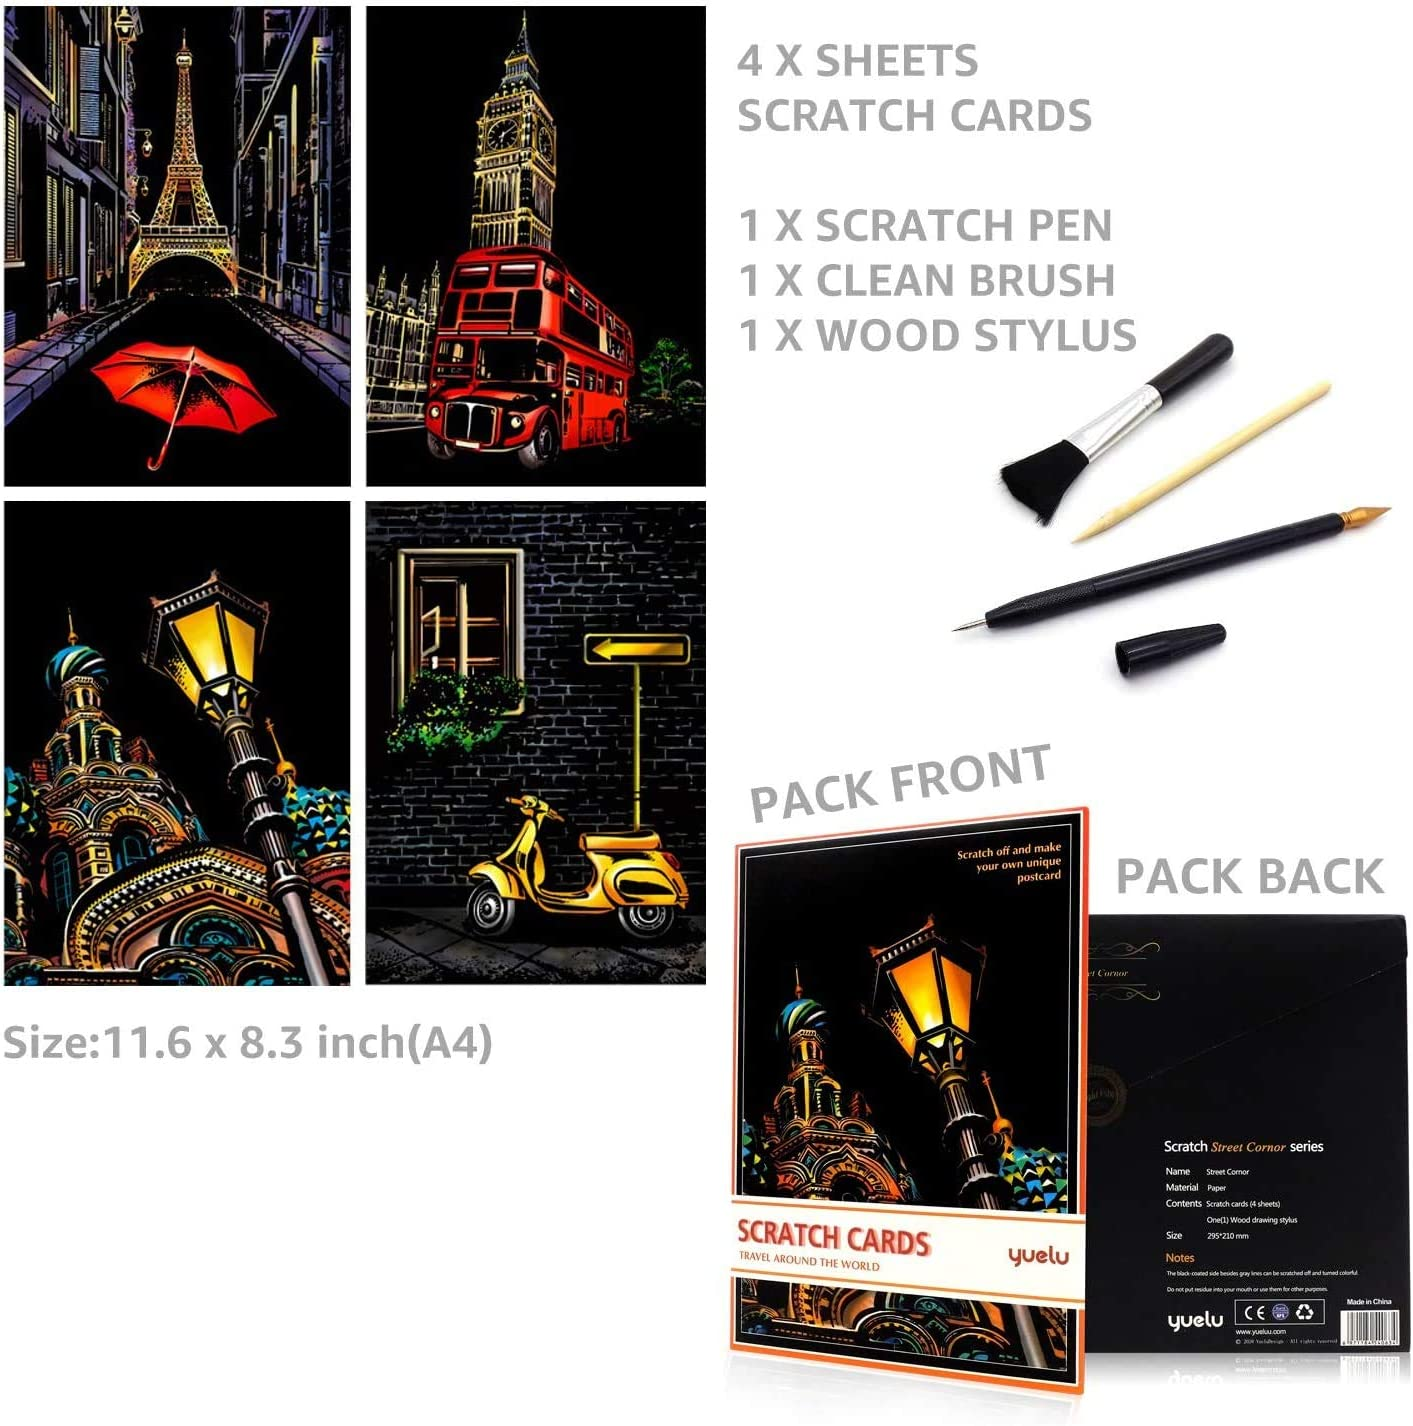 f/ür Kinder Erwachsene Beast-Serie Clean Brush Gravur Art Set: 4 Scratch Cards /& Scratch Drawing Pen Scratch /& Sketch Art Paper Regenbogenmalerei Night View Scratchboard Art /& Craft A4